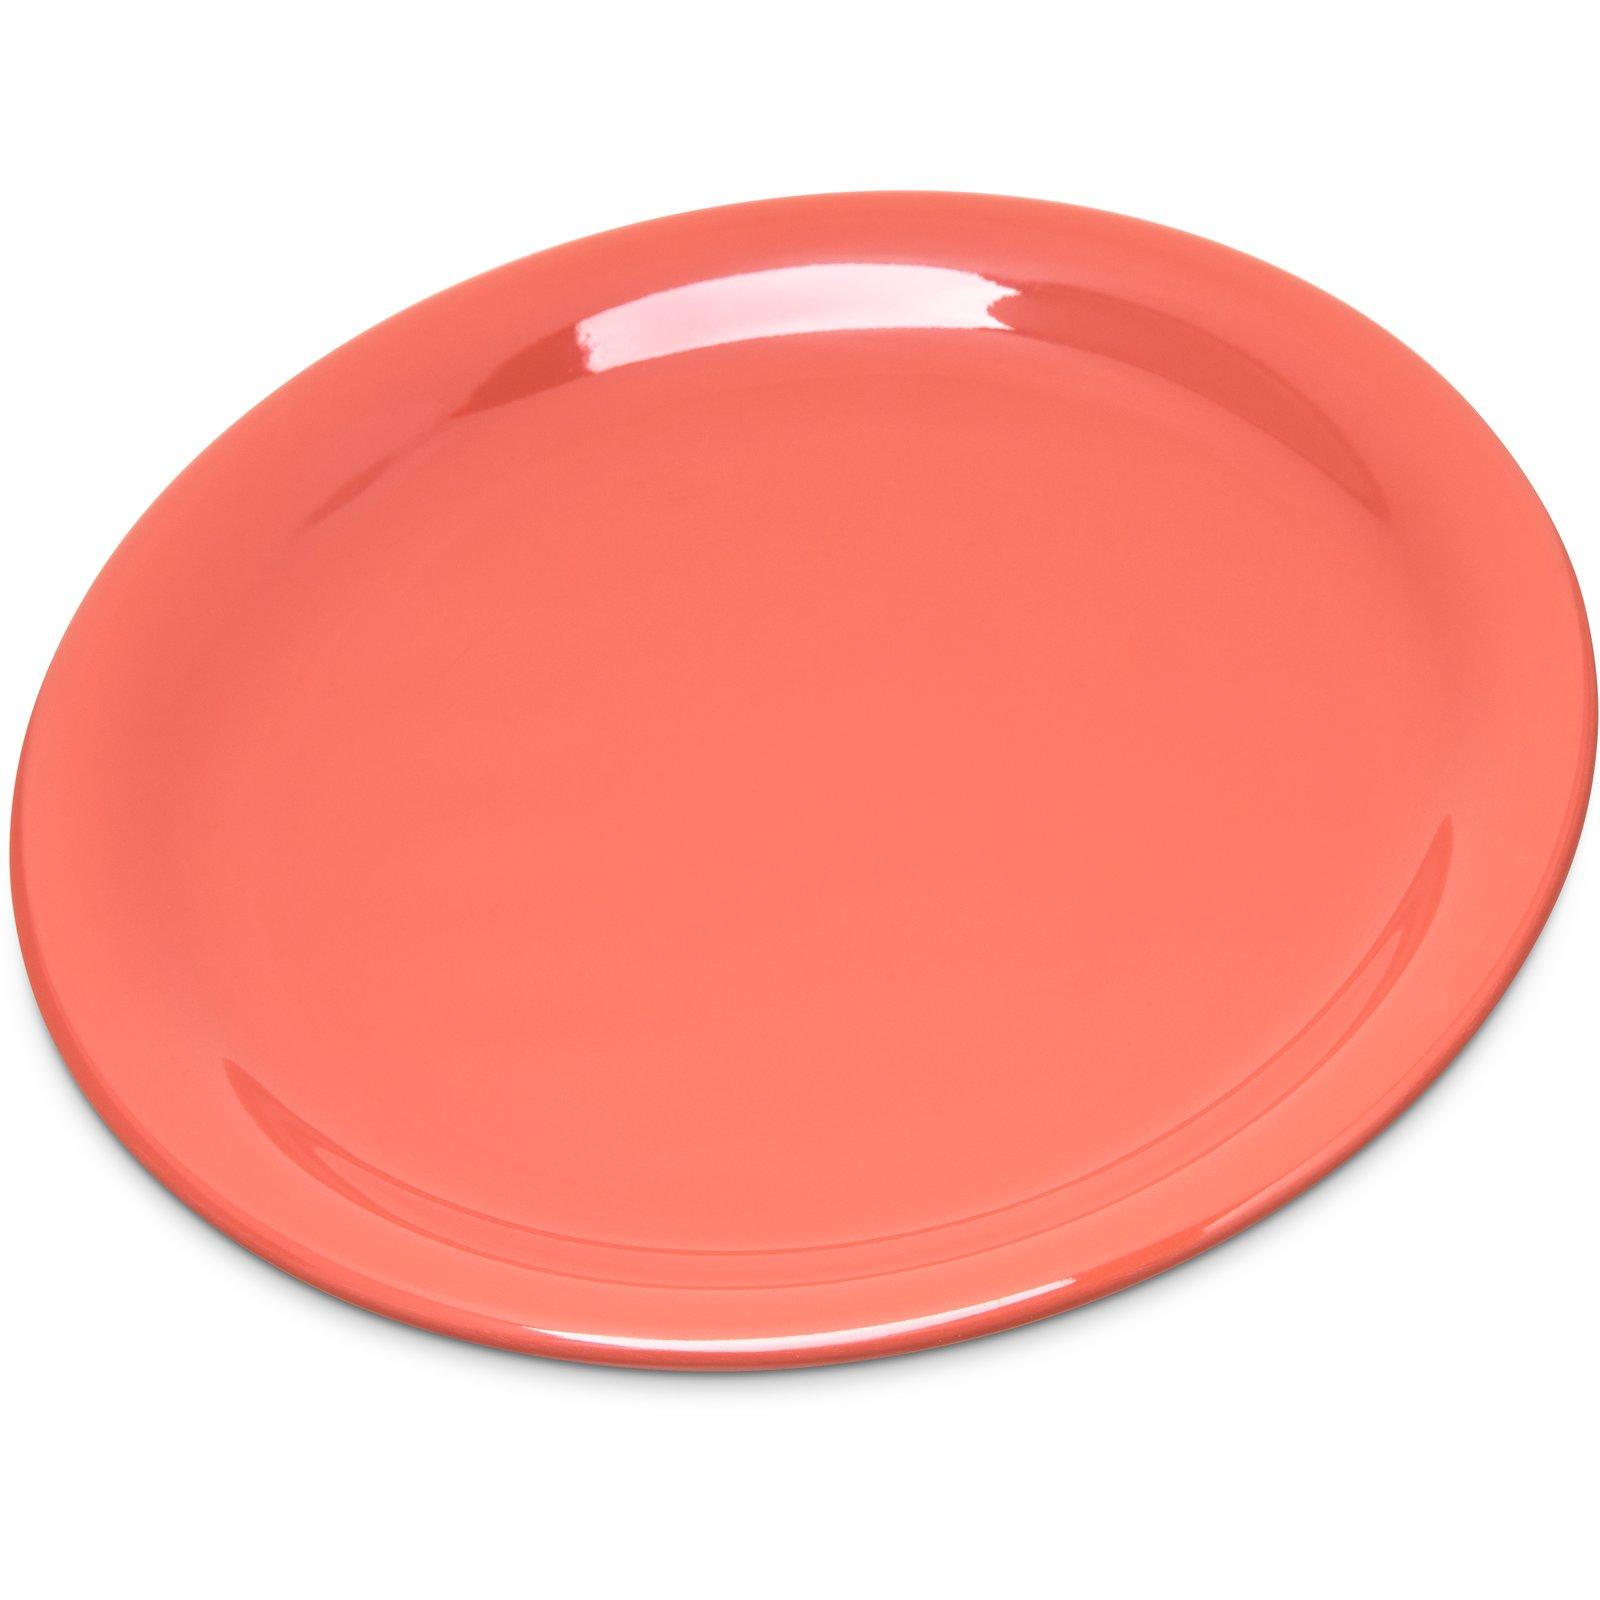 4300852 - Durus® Melamine Narrow Rim Pie Plate 6.5  - Sunset Orange  sc 1 st  Carlisle FoodService Products & 4300852 - Durus® Melamine Narrow Rim Pie Plate 6.5